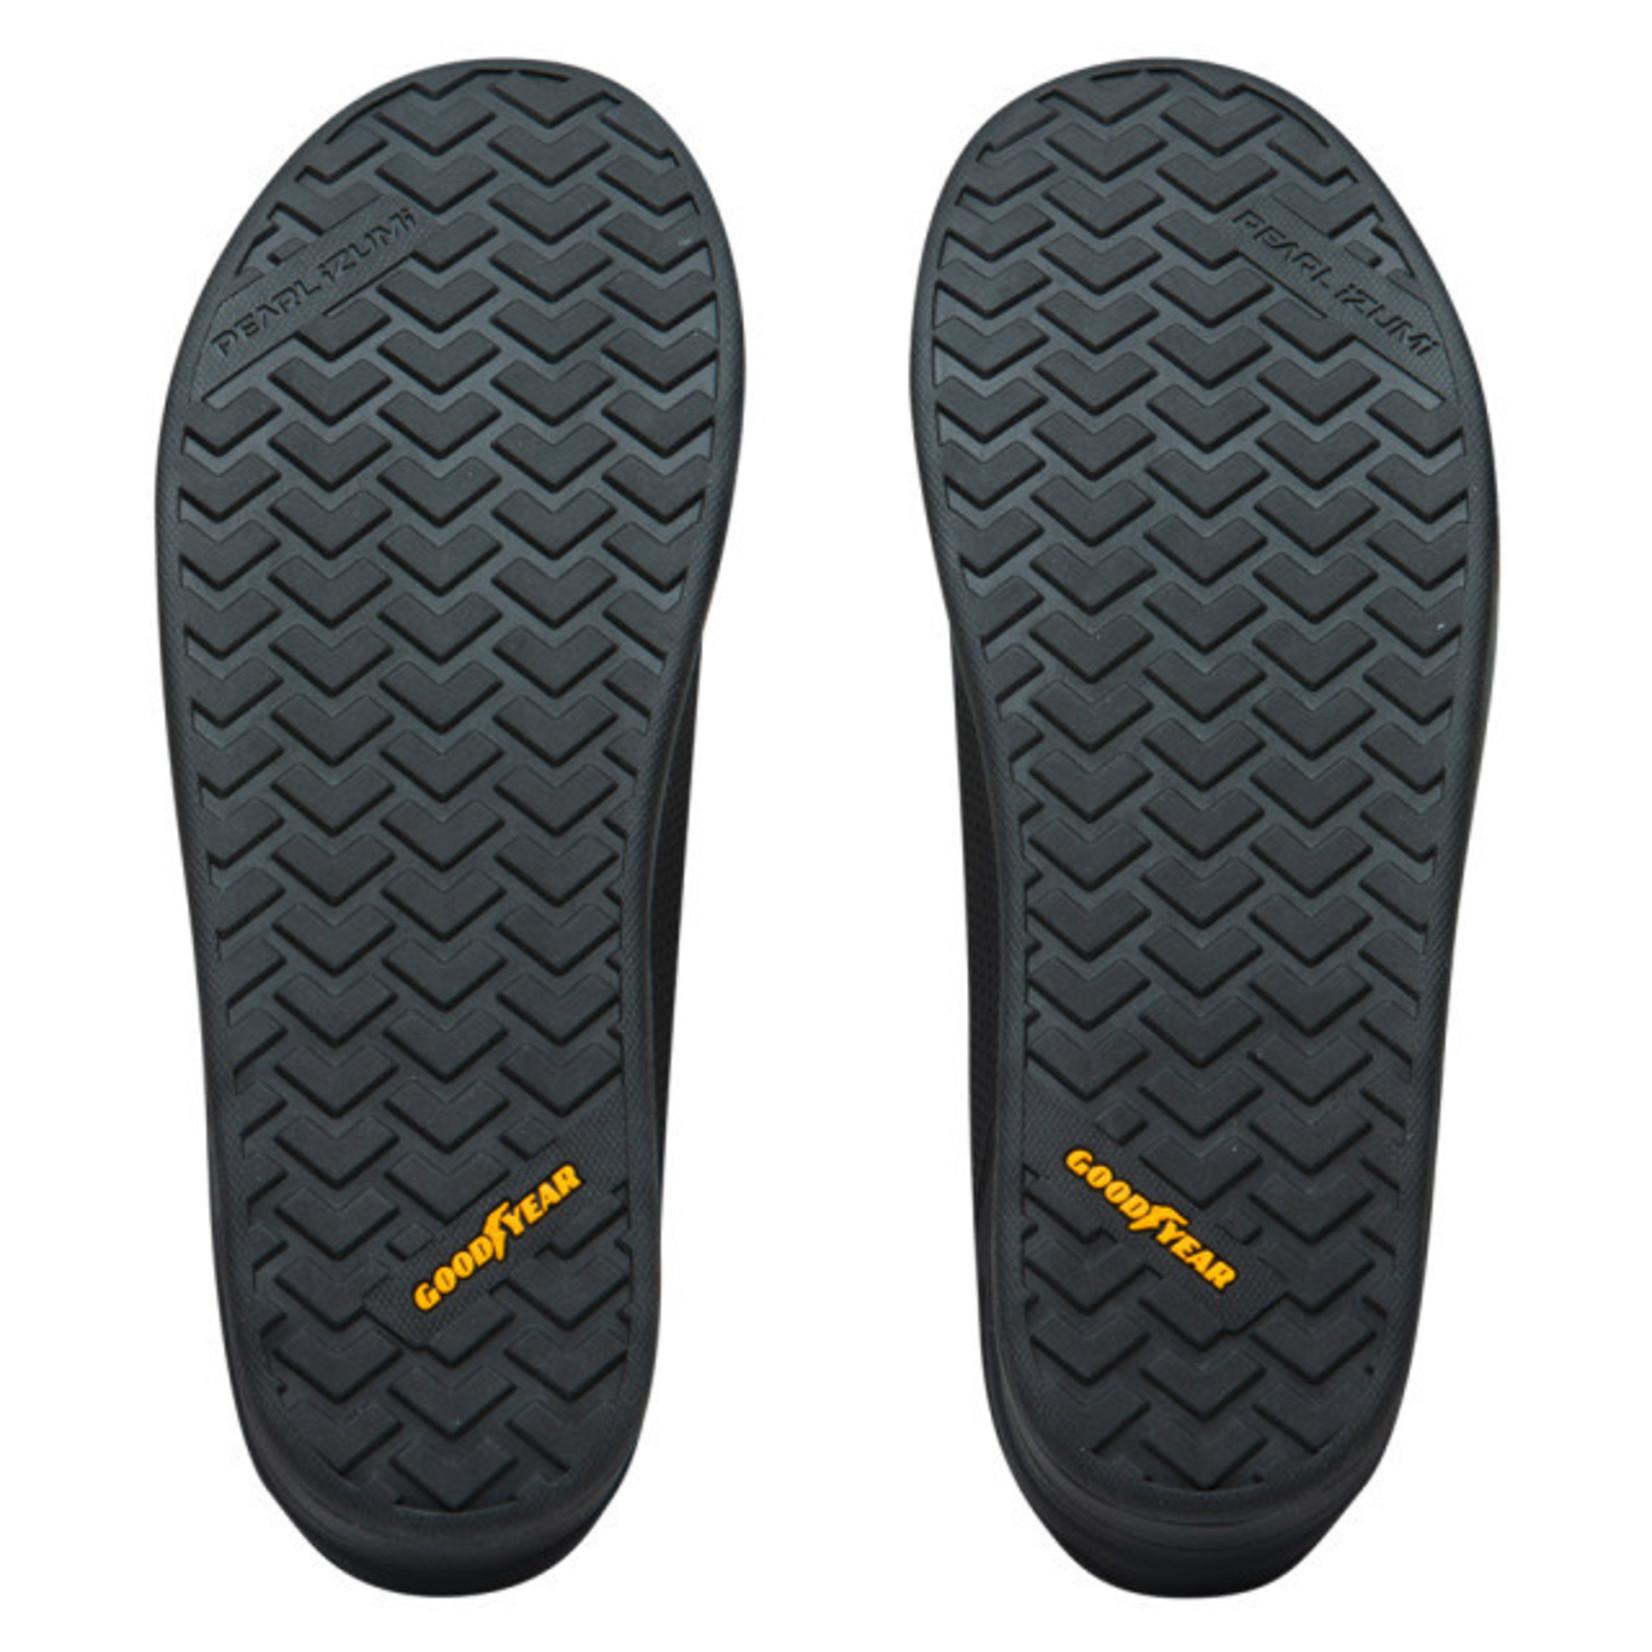 Pearl iZUMi Pearl iZUMi scarpe Men MTB X-Alp Launch phantom black